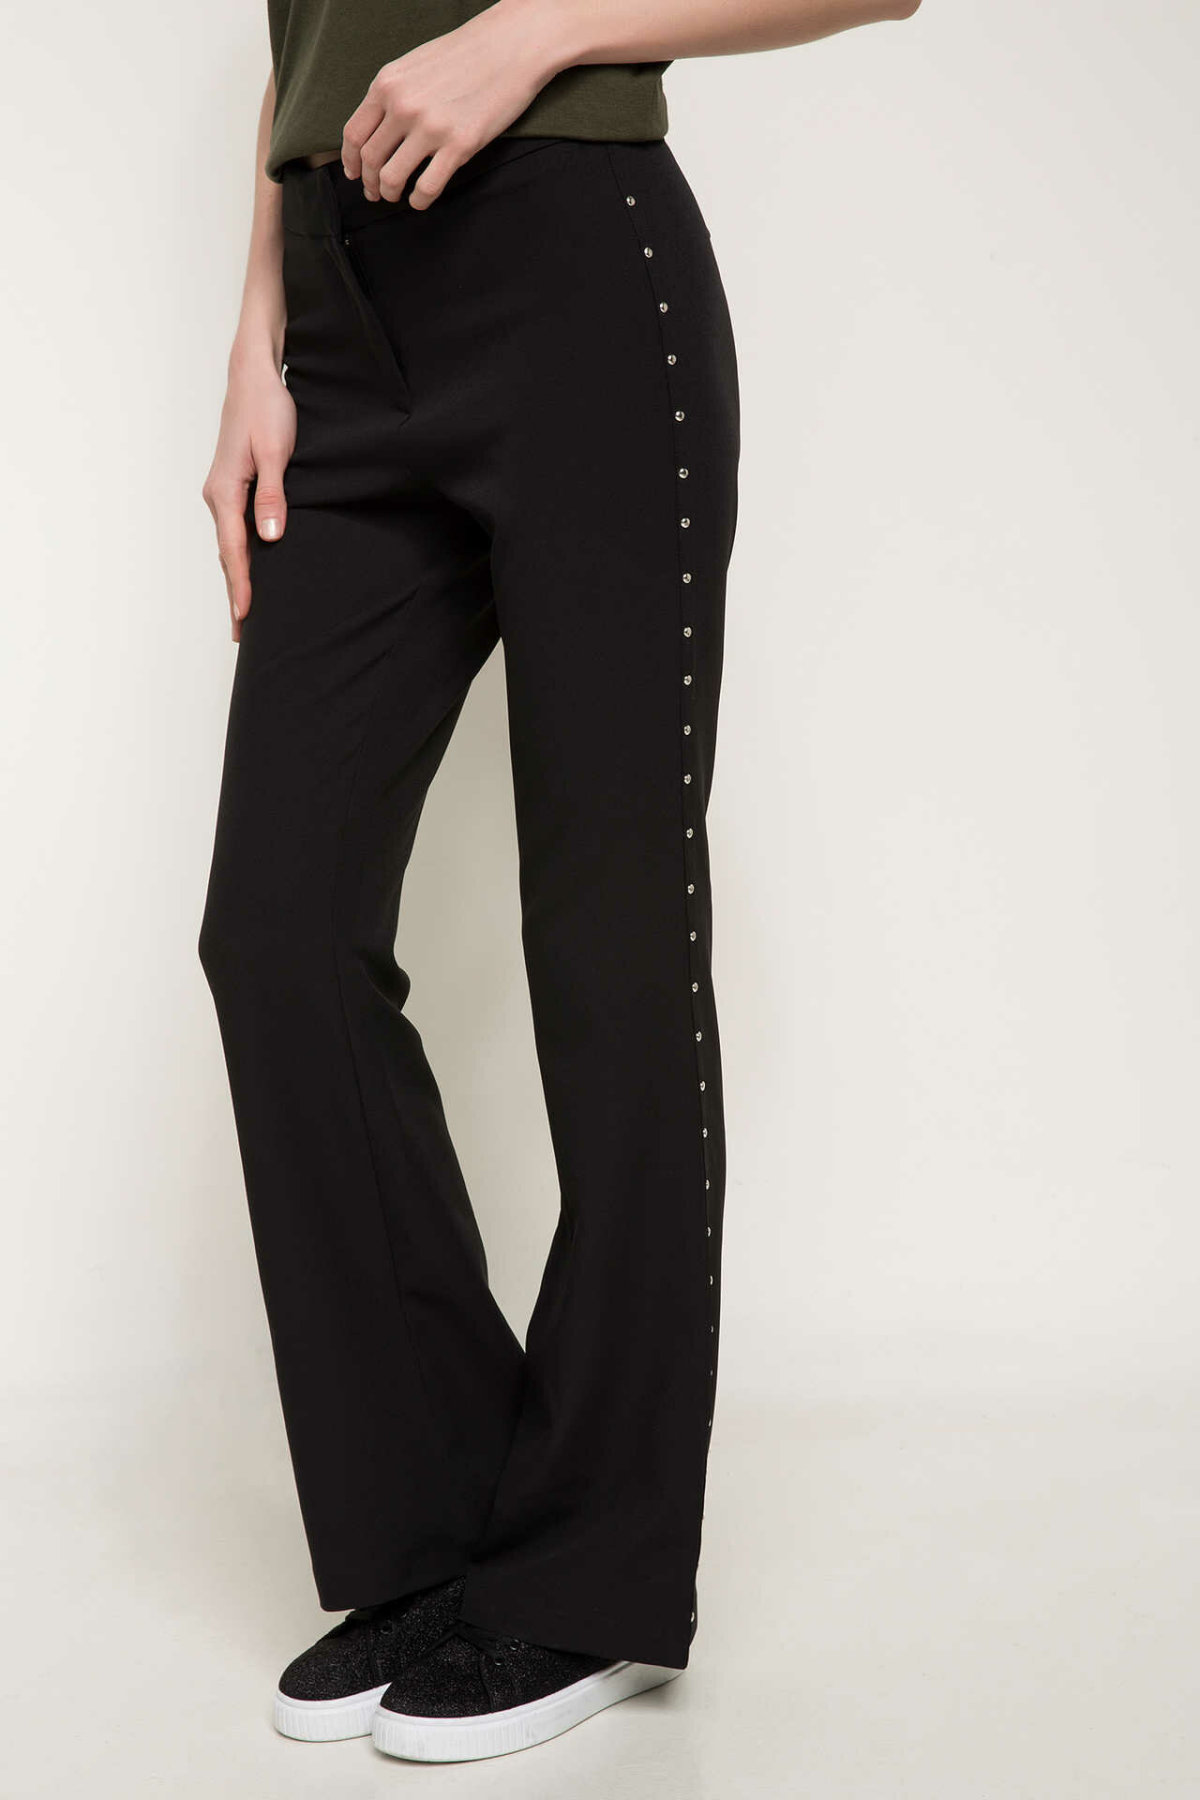 DeFacto Women Spring Black Wide-leg Pants Women Casual Fit Slim Bottoms Women Stylish Bling Decors Trousers-I9934AZ18SP